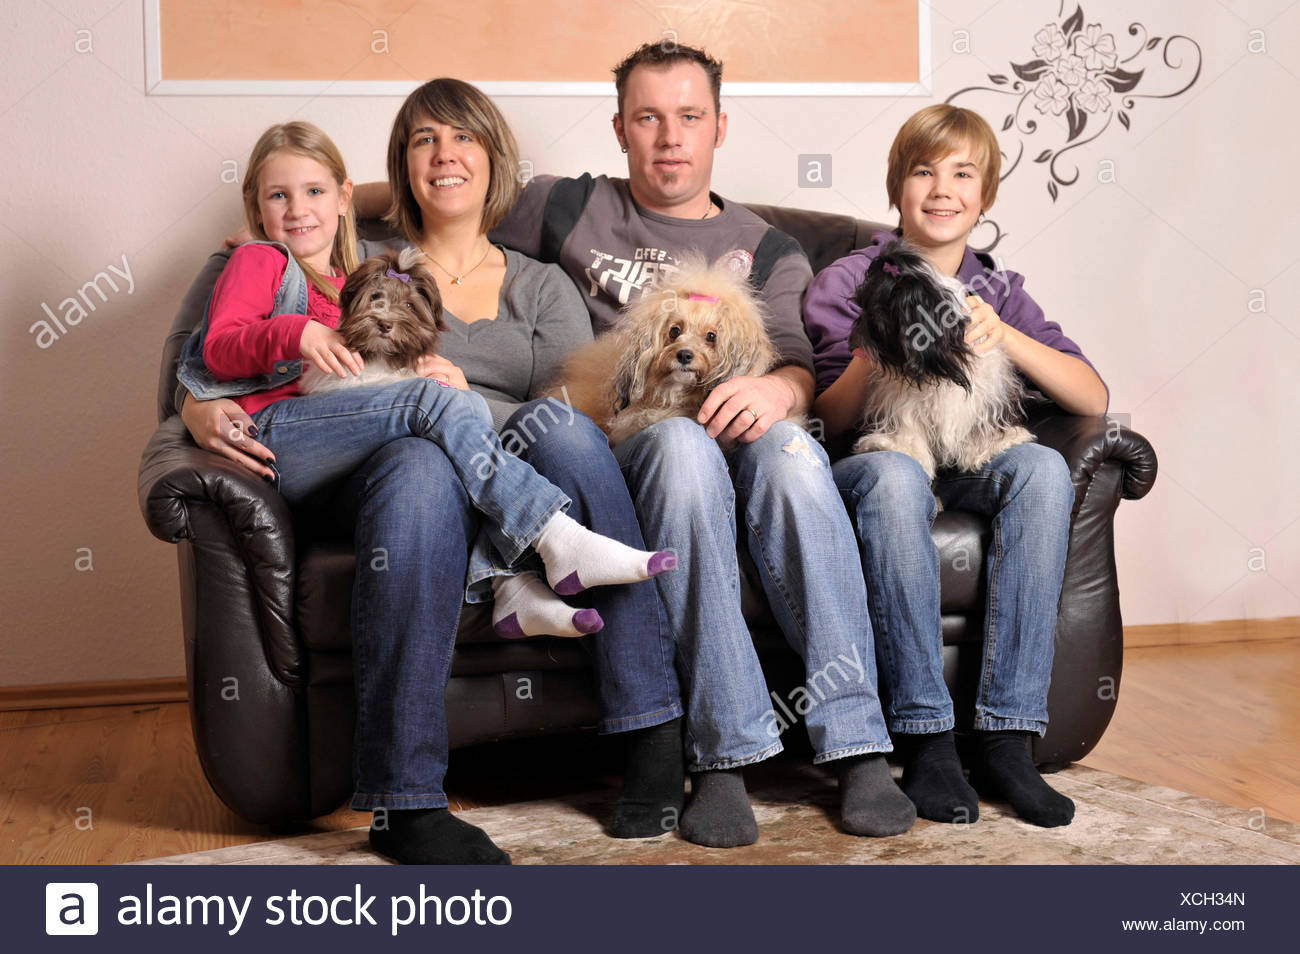 Familie mit Havaneser / family with havanese Stock Photo